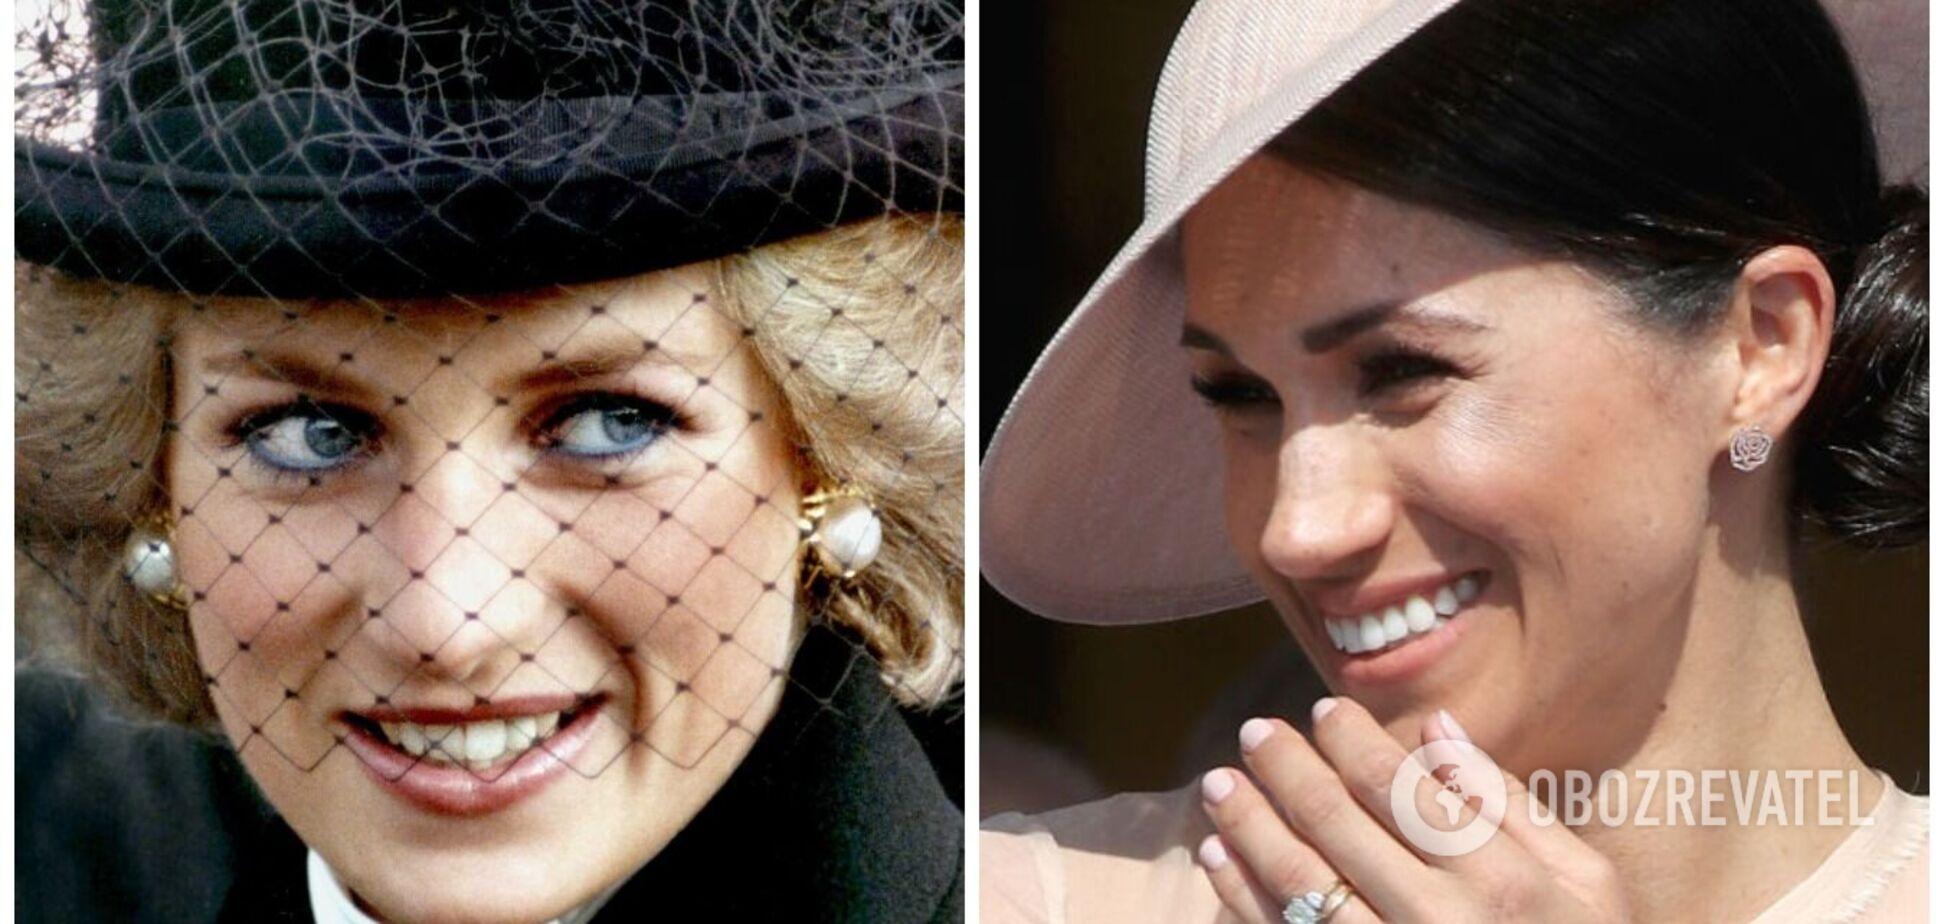 Бунтарки Меган Маркл и принцесса Диана: самые громкие скандалы при дворе